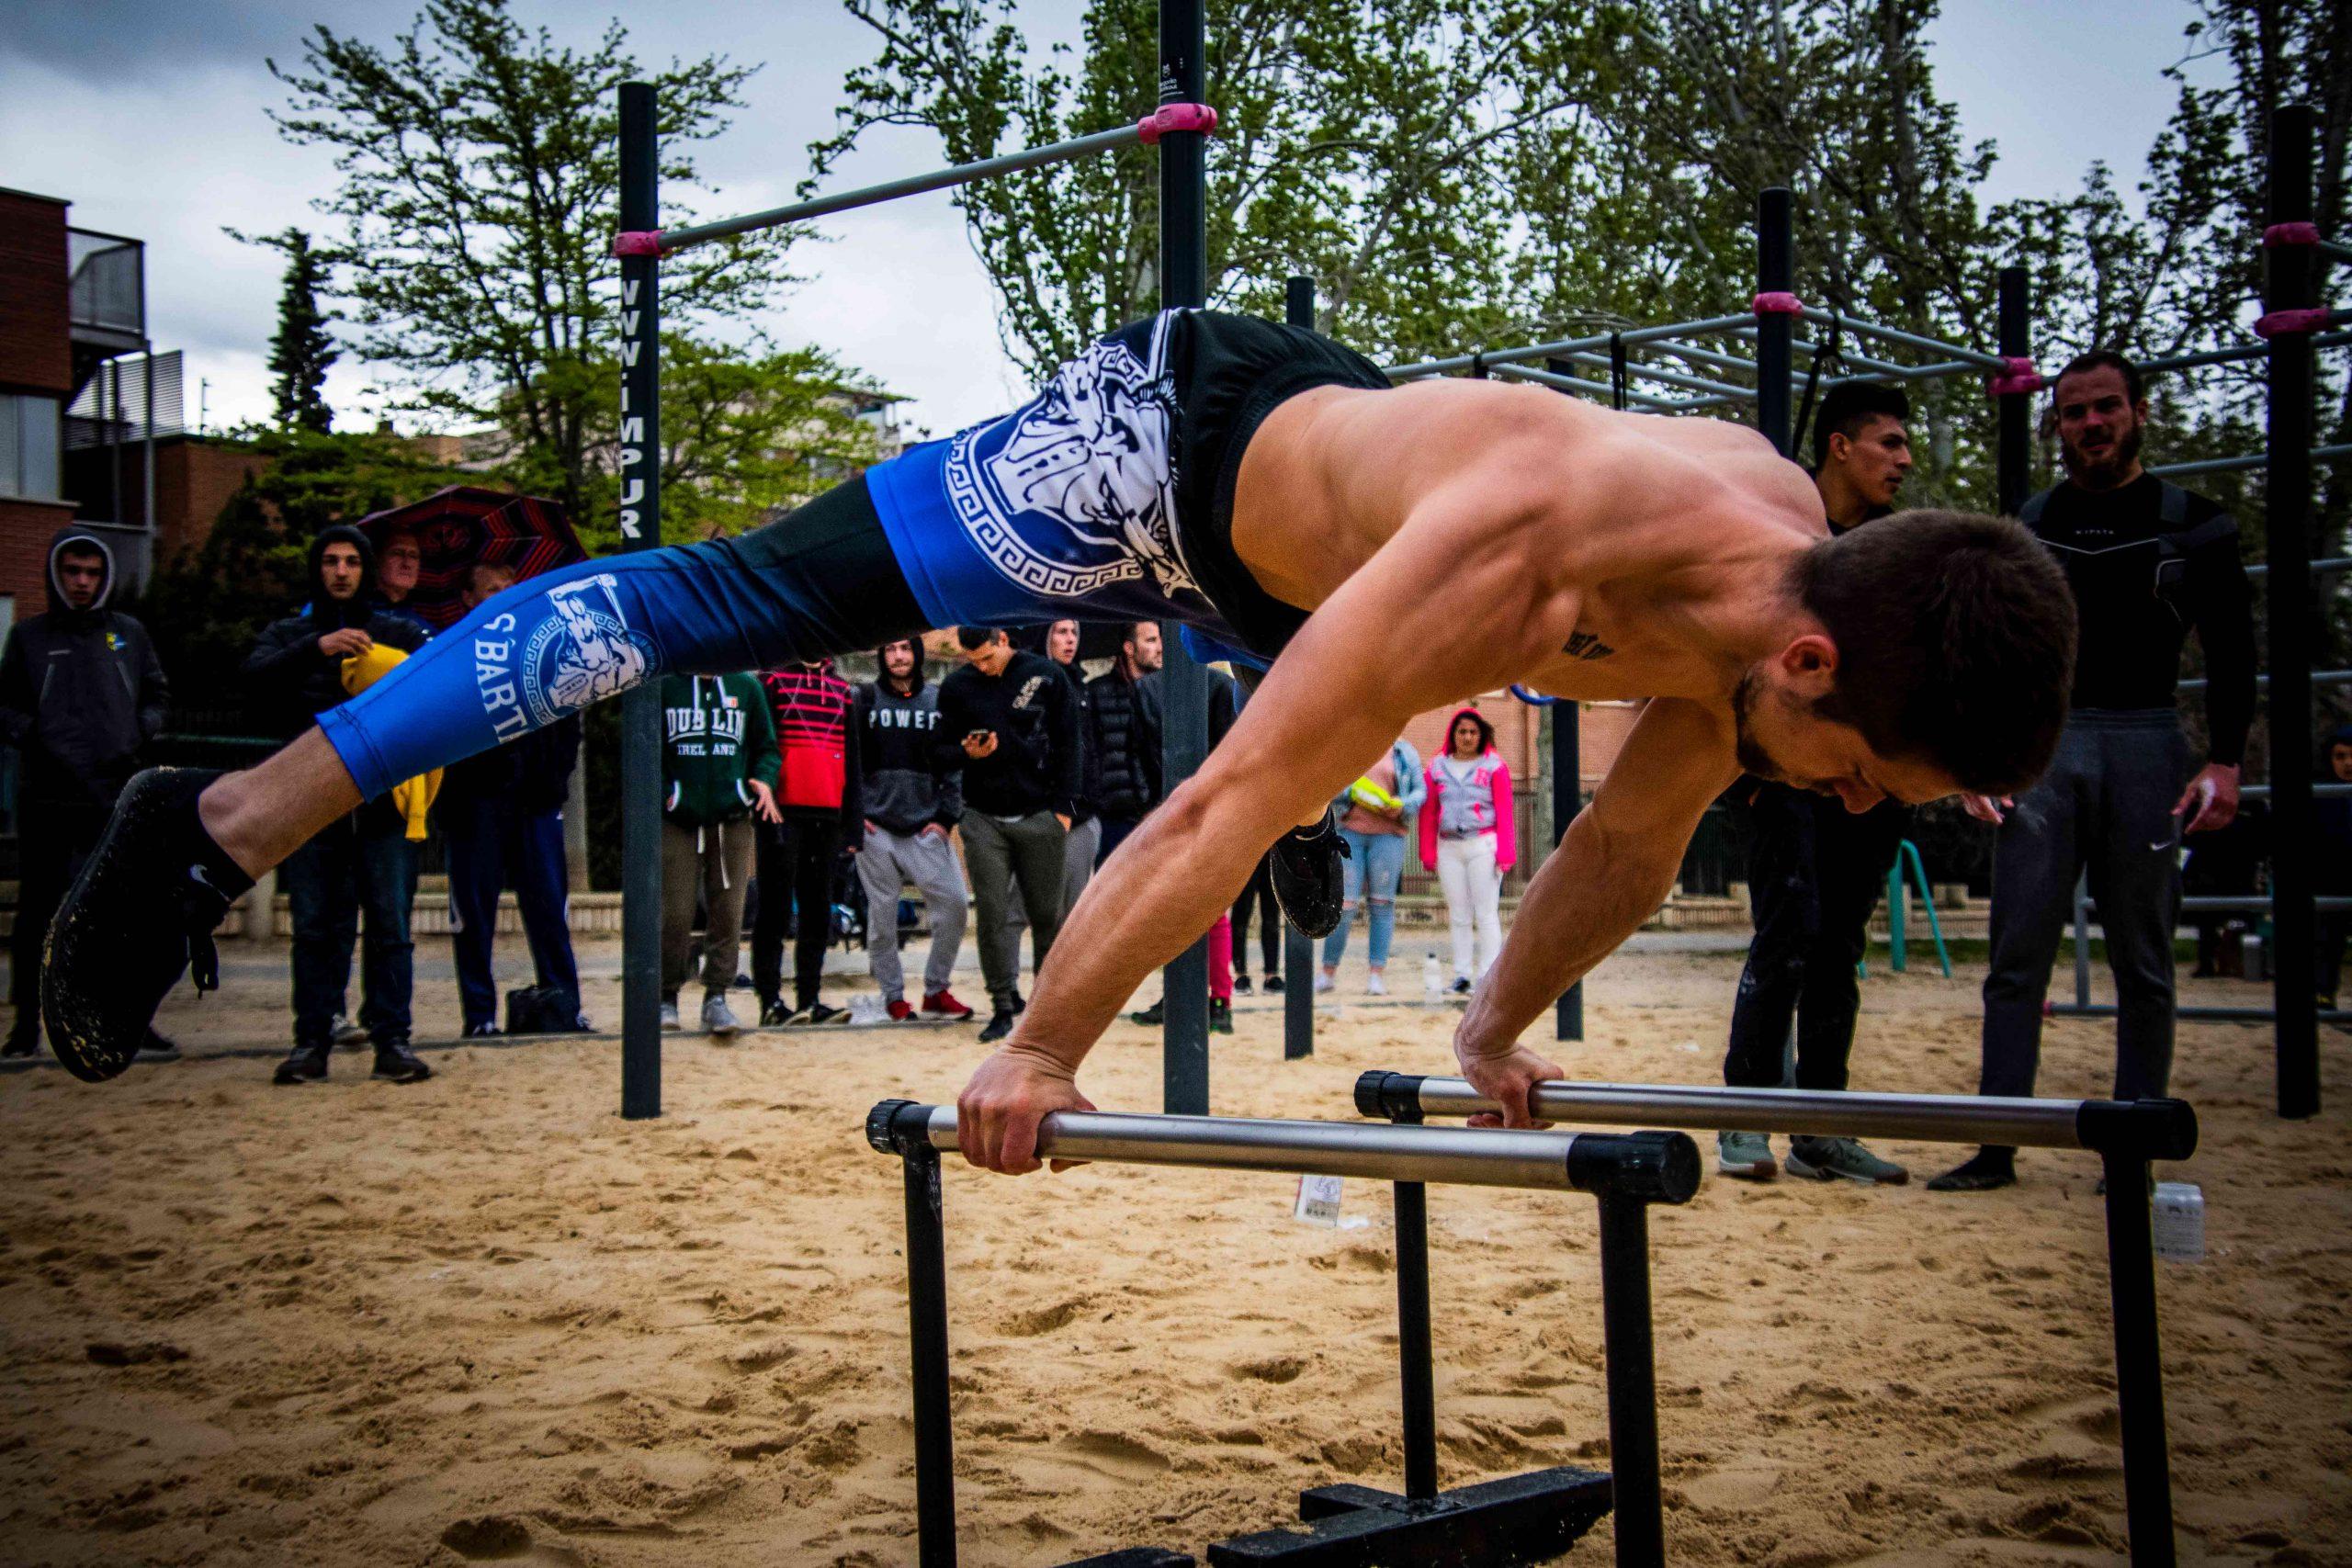 batallas de calistenia y street workout